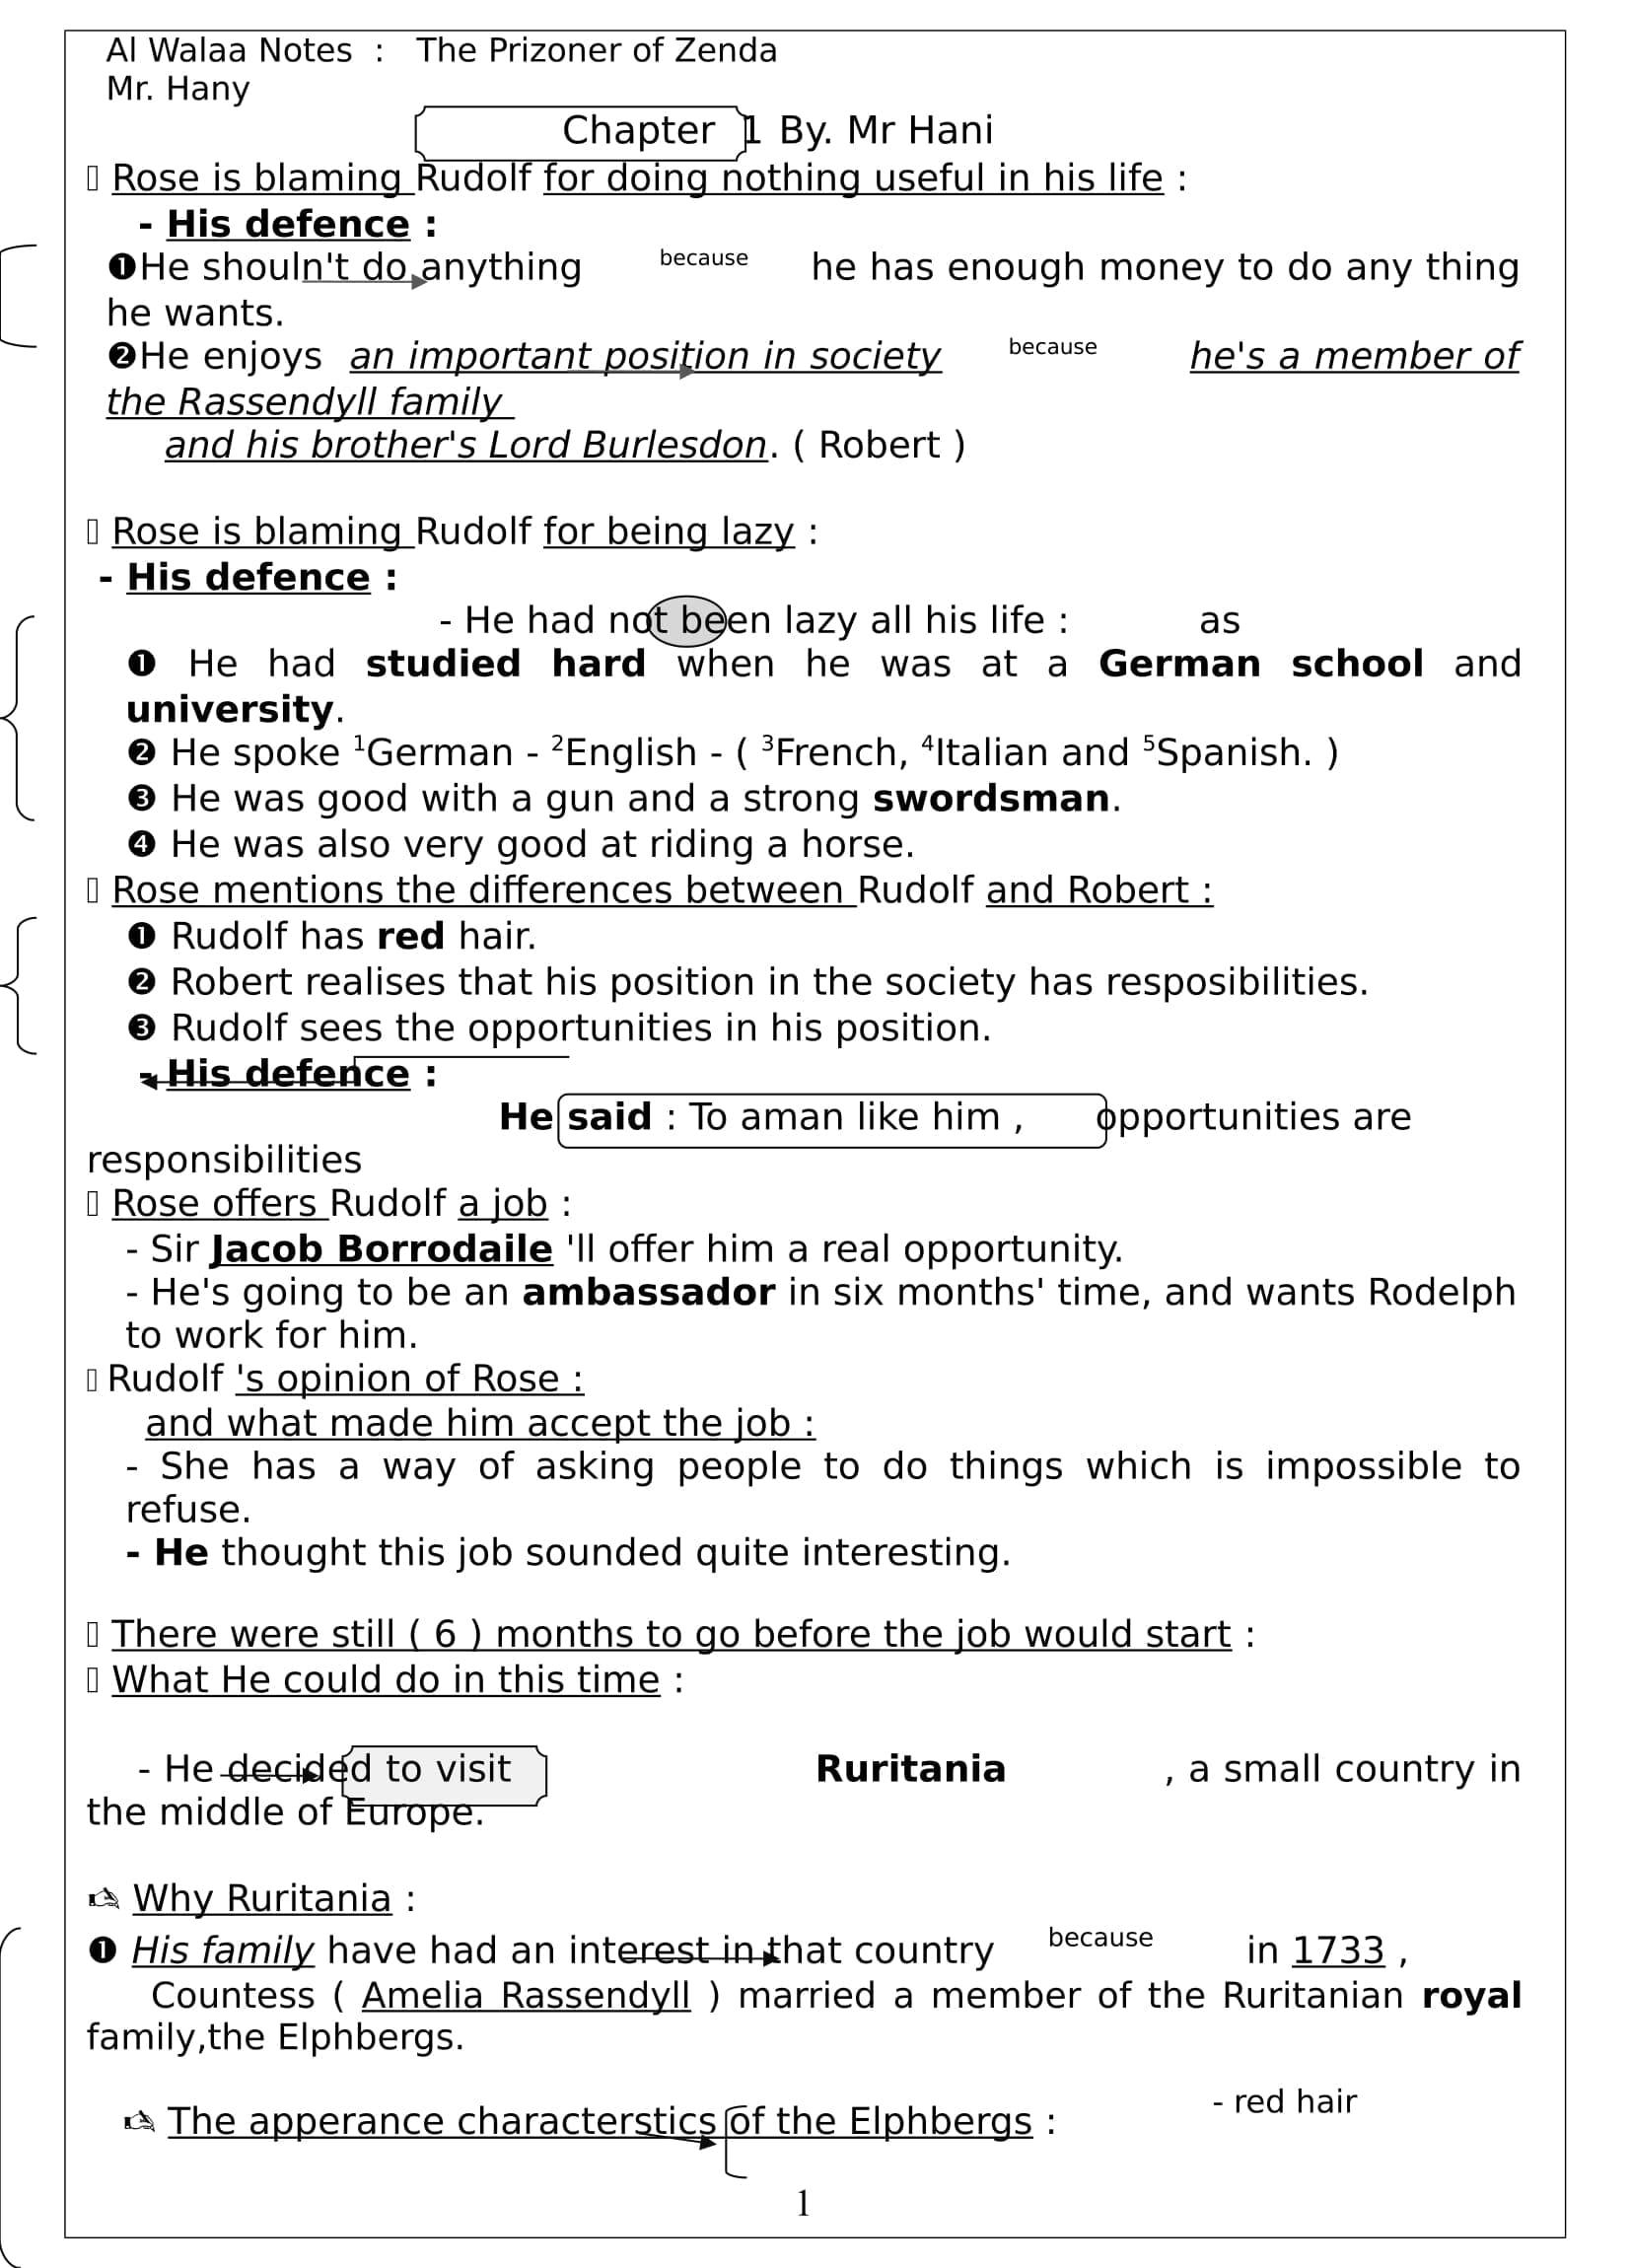 exam-eg.com_1507898705031.jpg